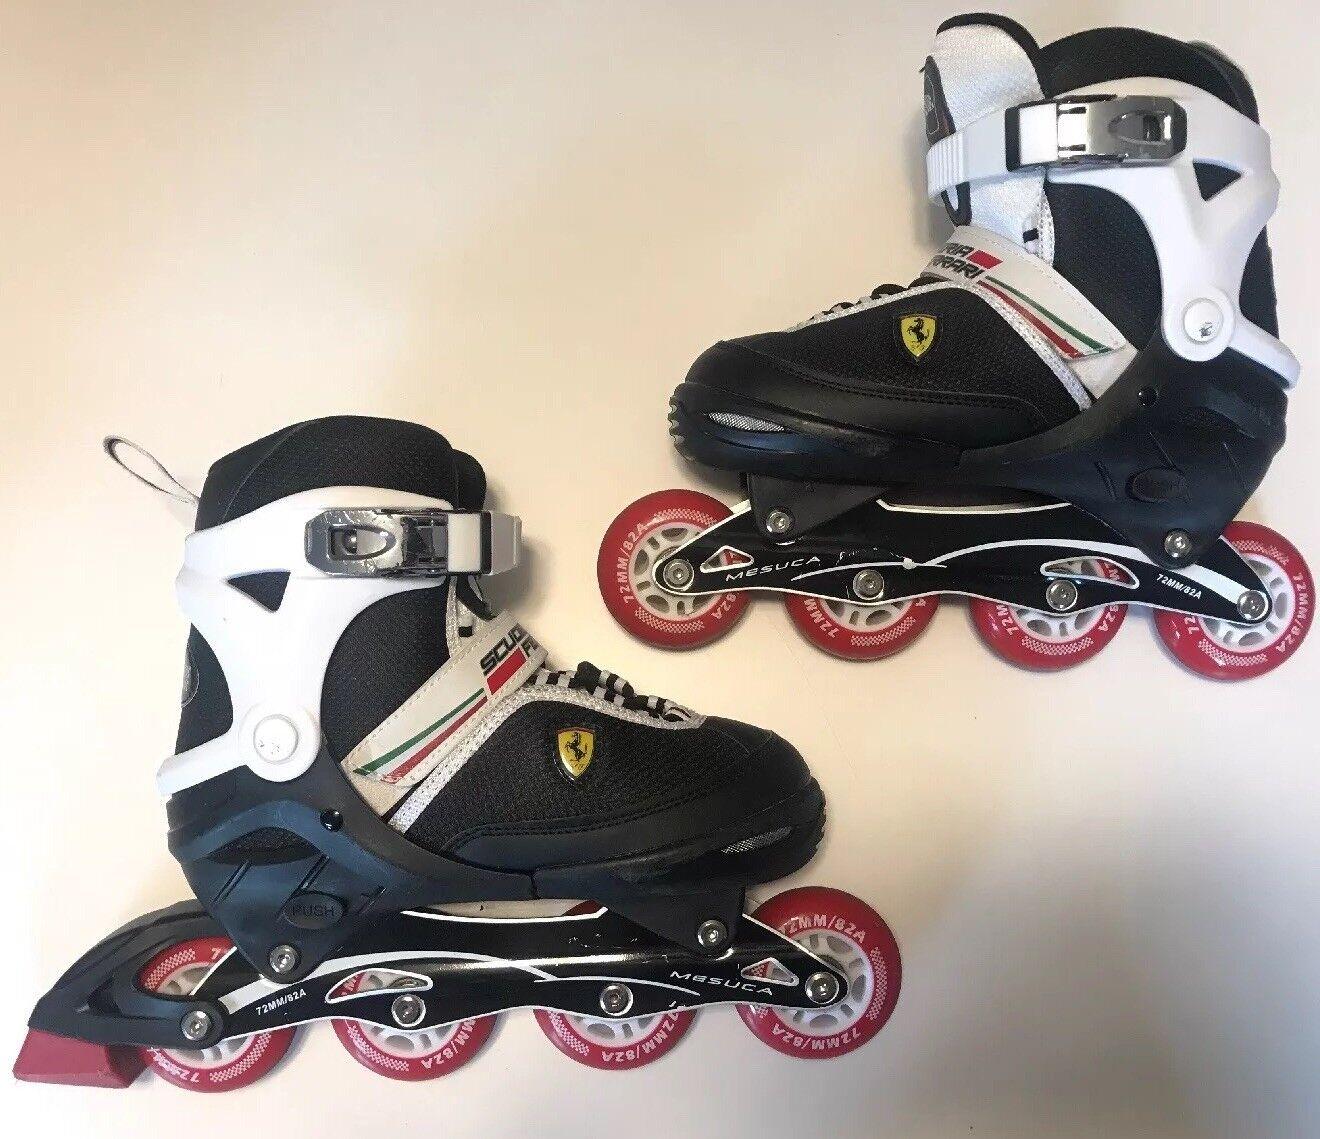 Rare Rare Rare Adjustable Inline Skate Scuderia Ferrari  rollerblades 72mm e36409